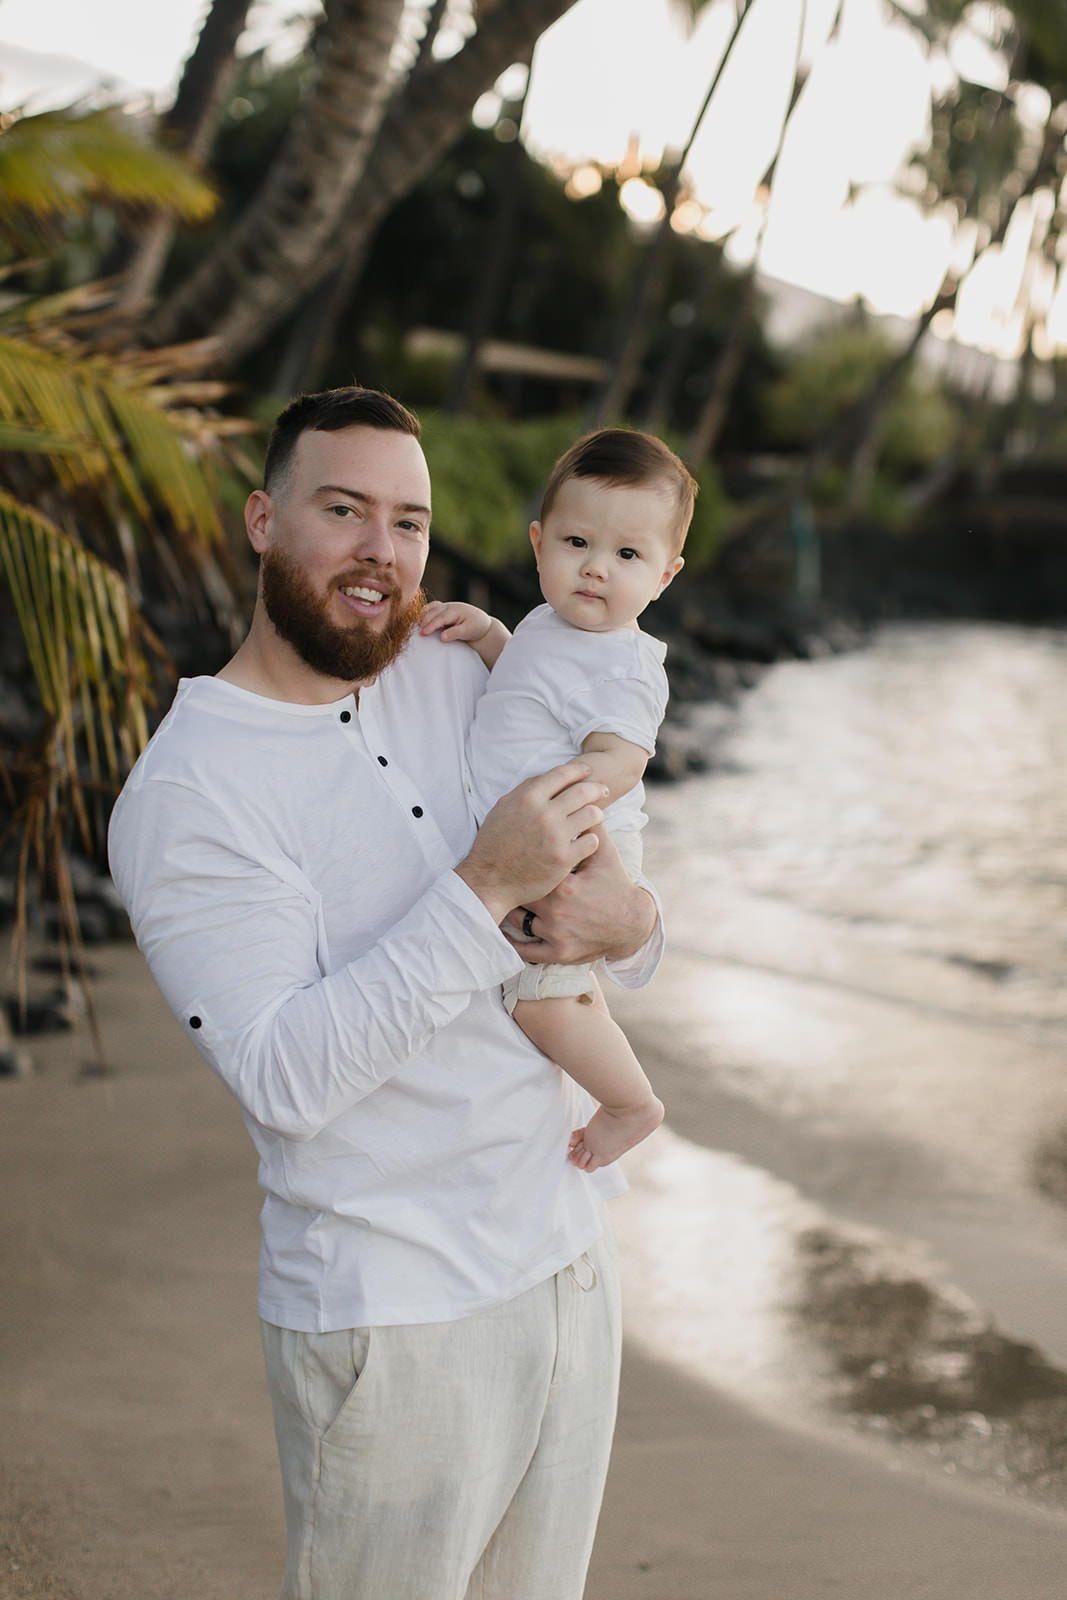 Maui Family Photos, Maui Family Photos What To Wear, Maui